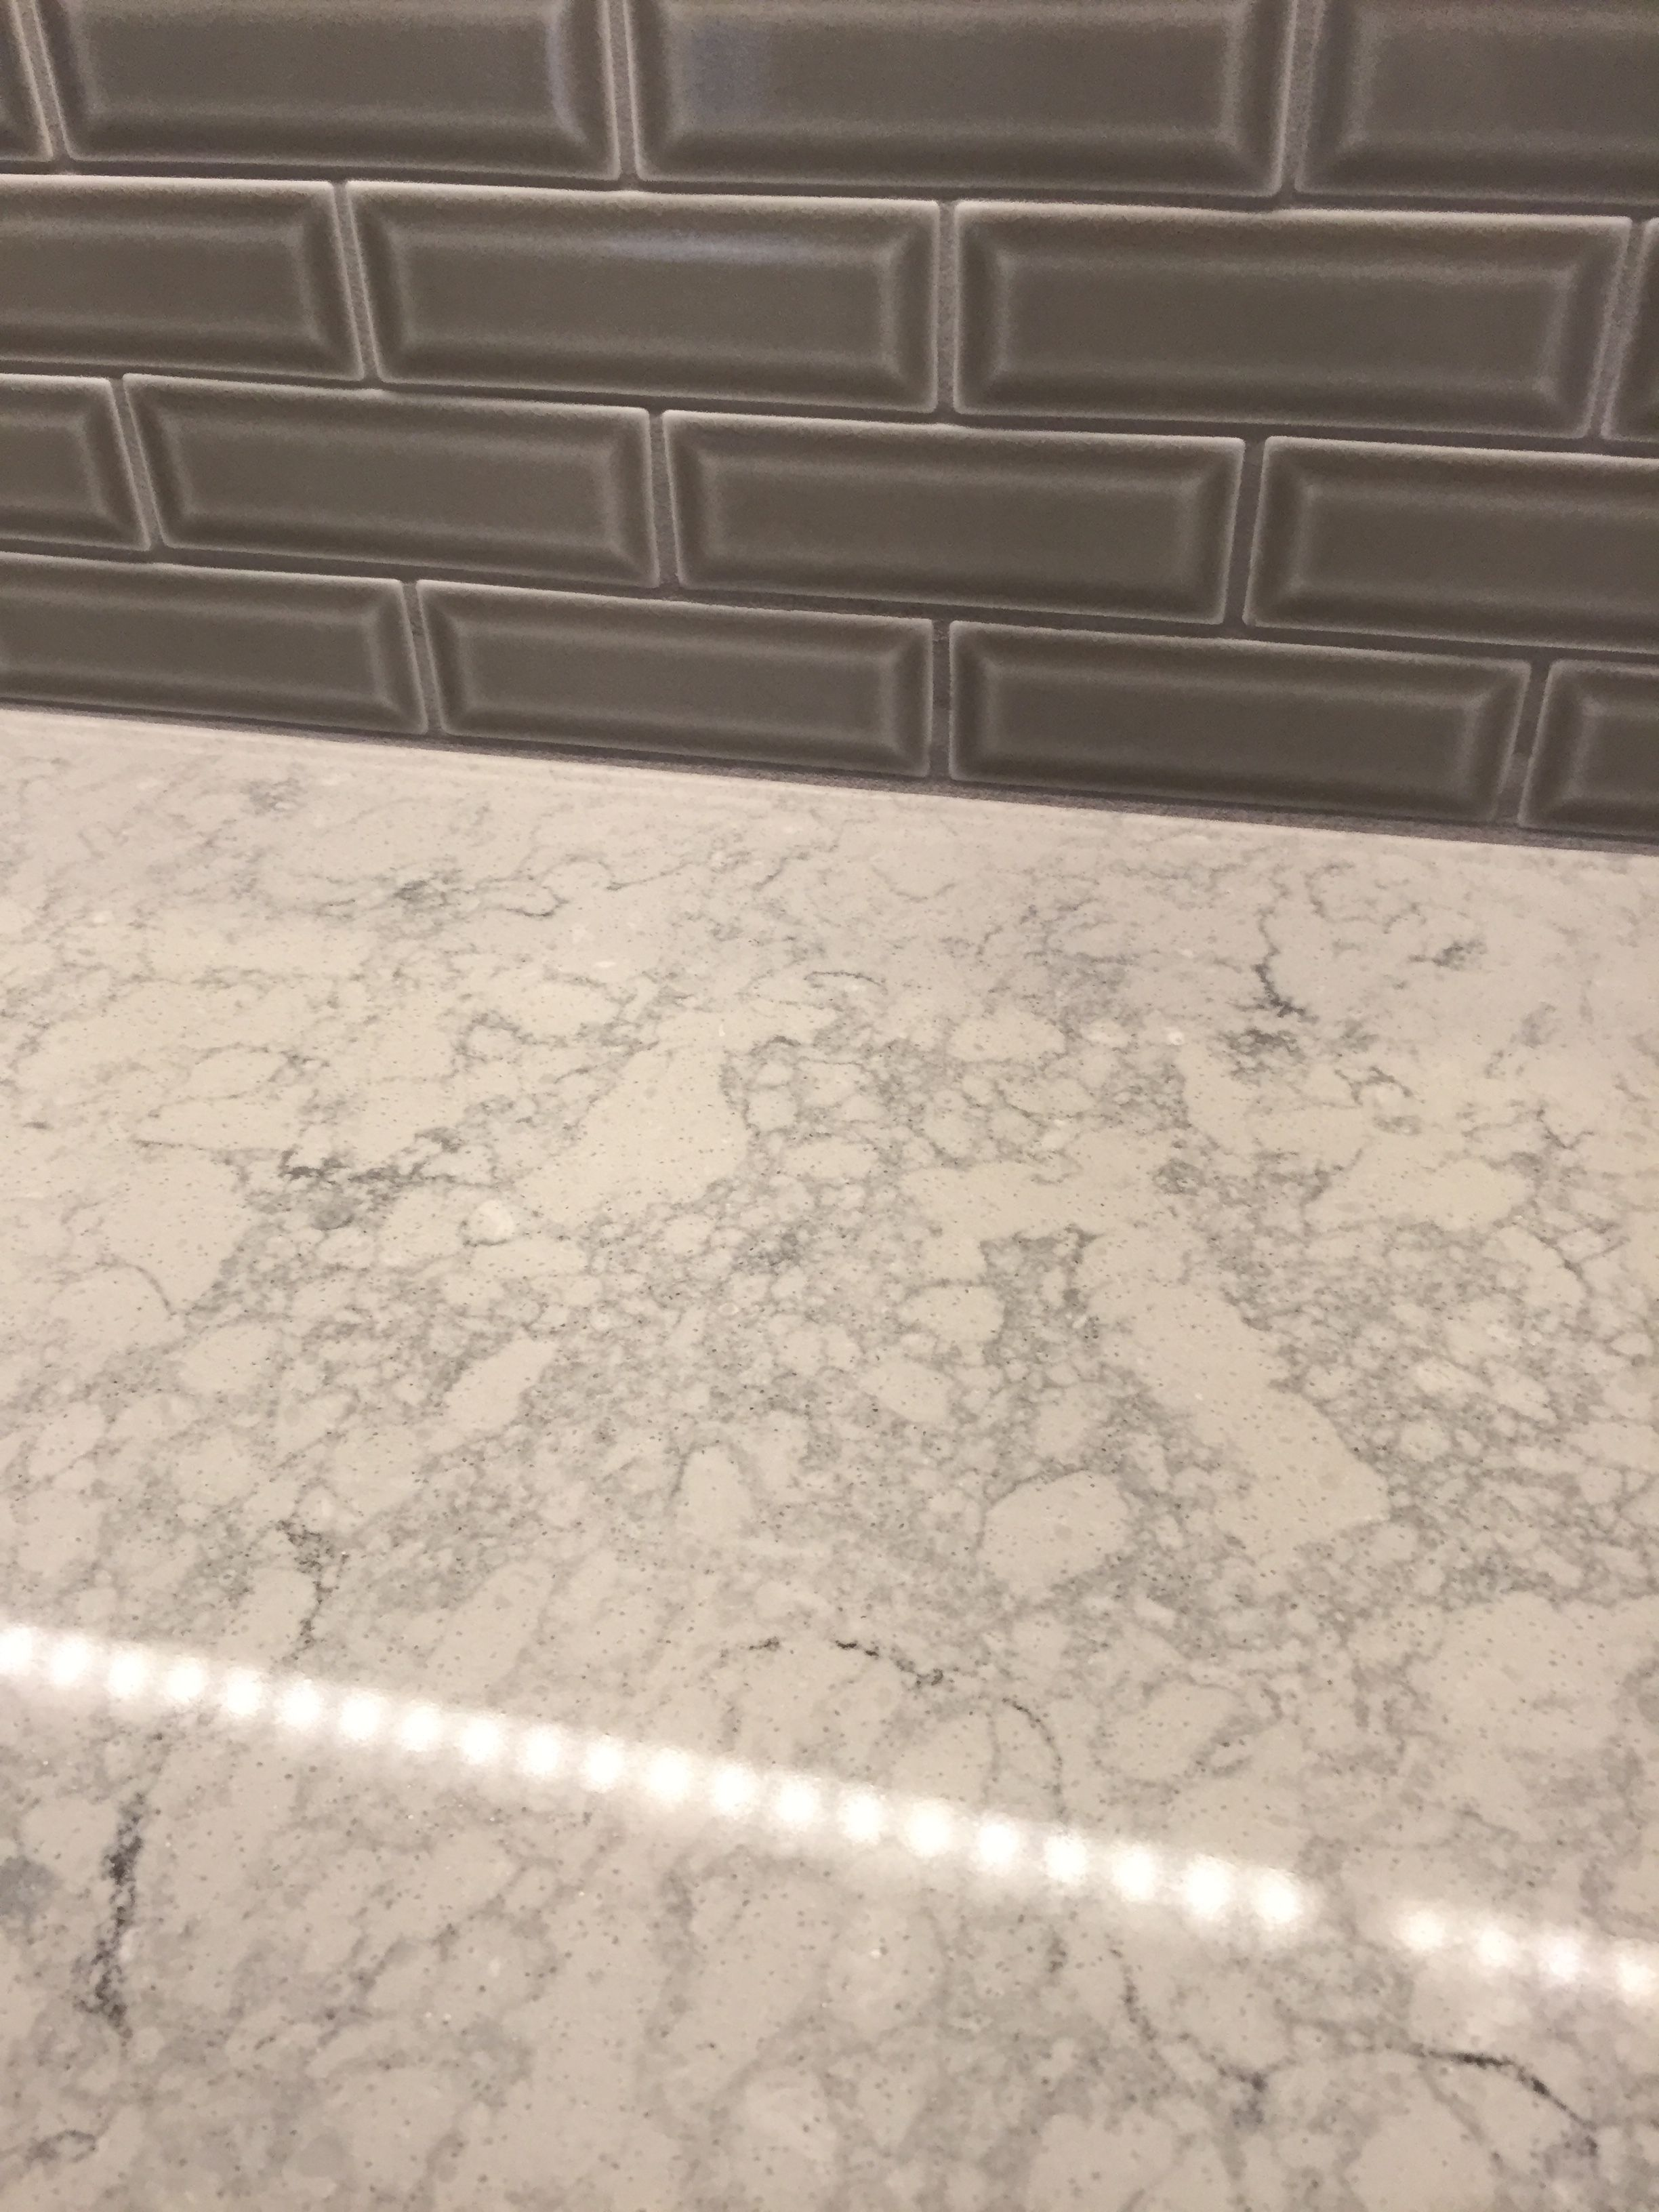 Caesarstone Montblanc Quartz Msi Dove Gray Beveled 2x6 Tile